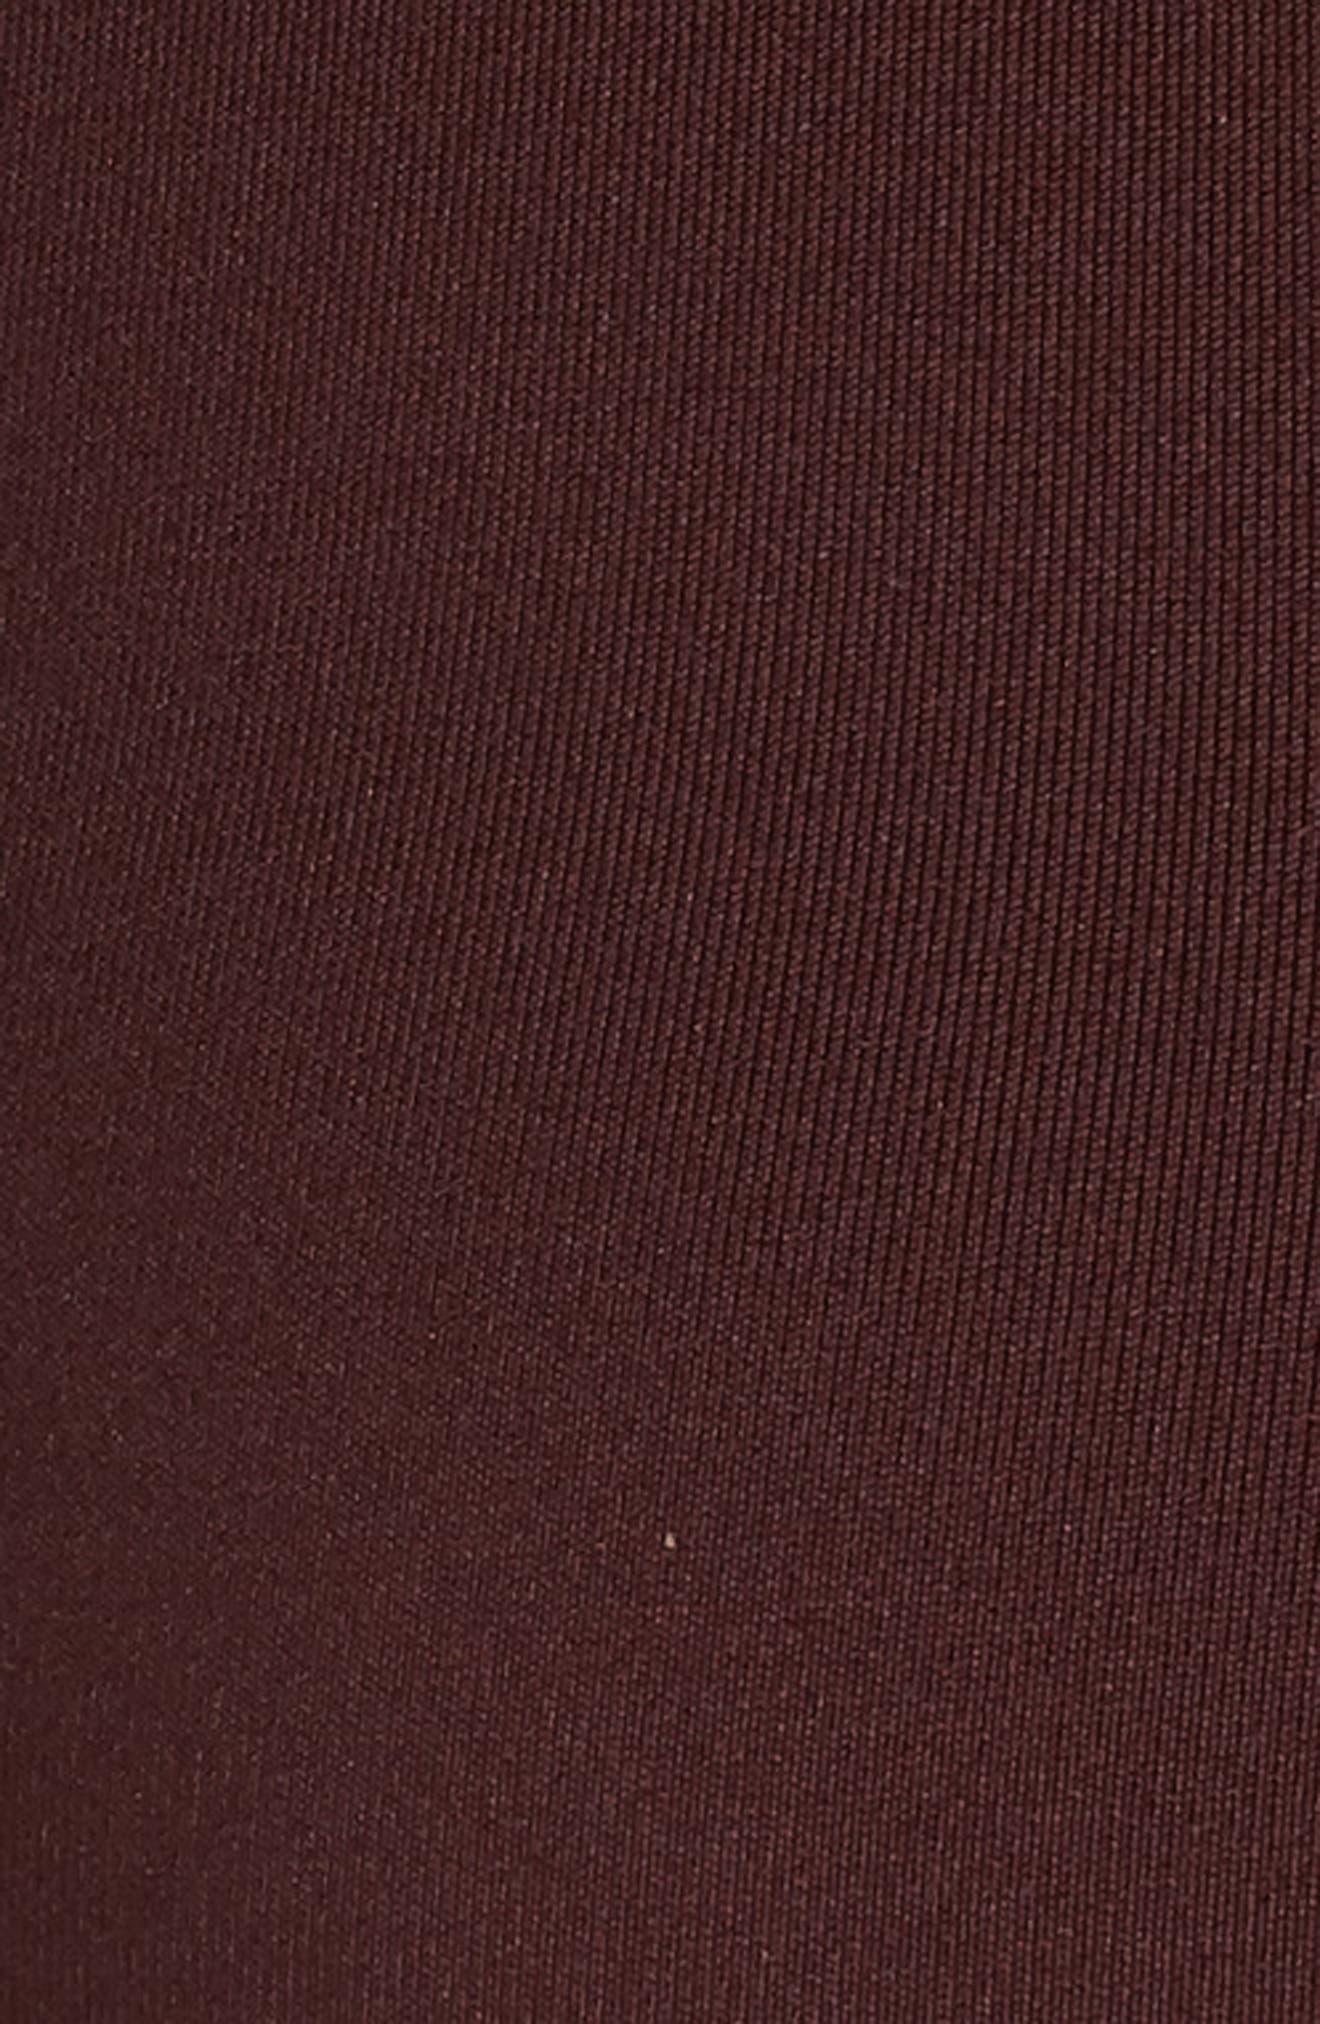 NIKE, Indy Dry Cutout Sports Bra, Alternate thumbnail 6, color, BURGUNDY CRUSH/ BLACK